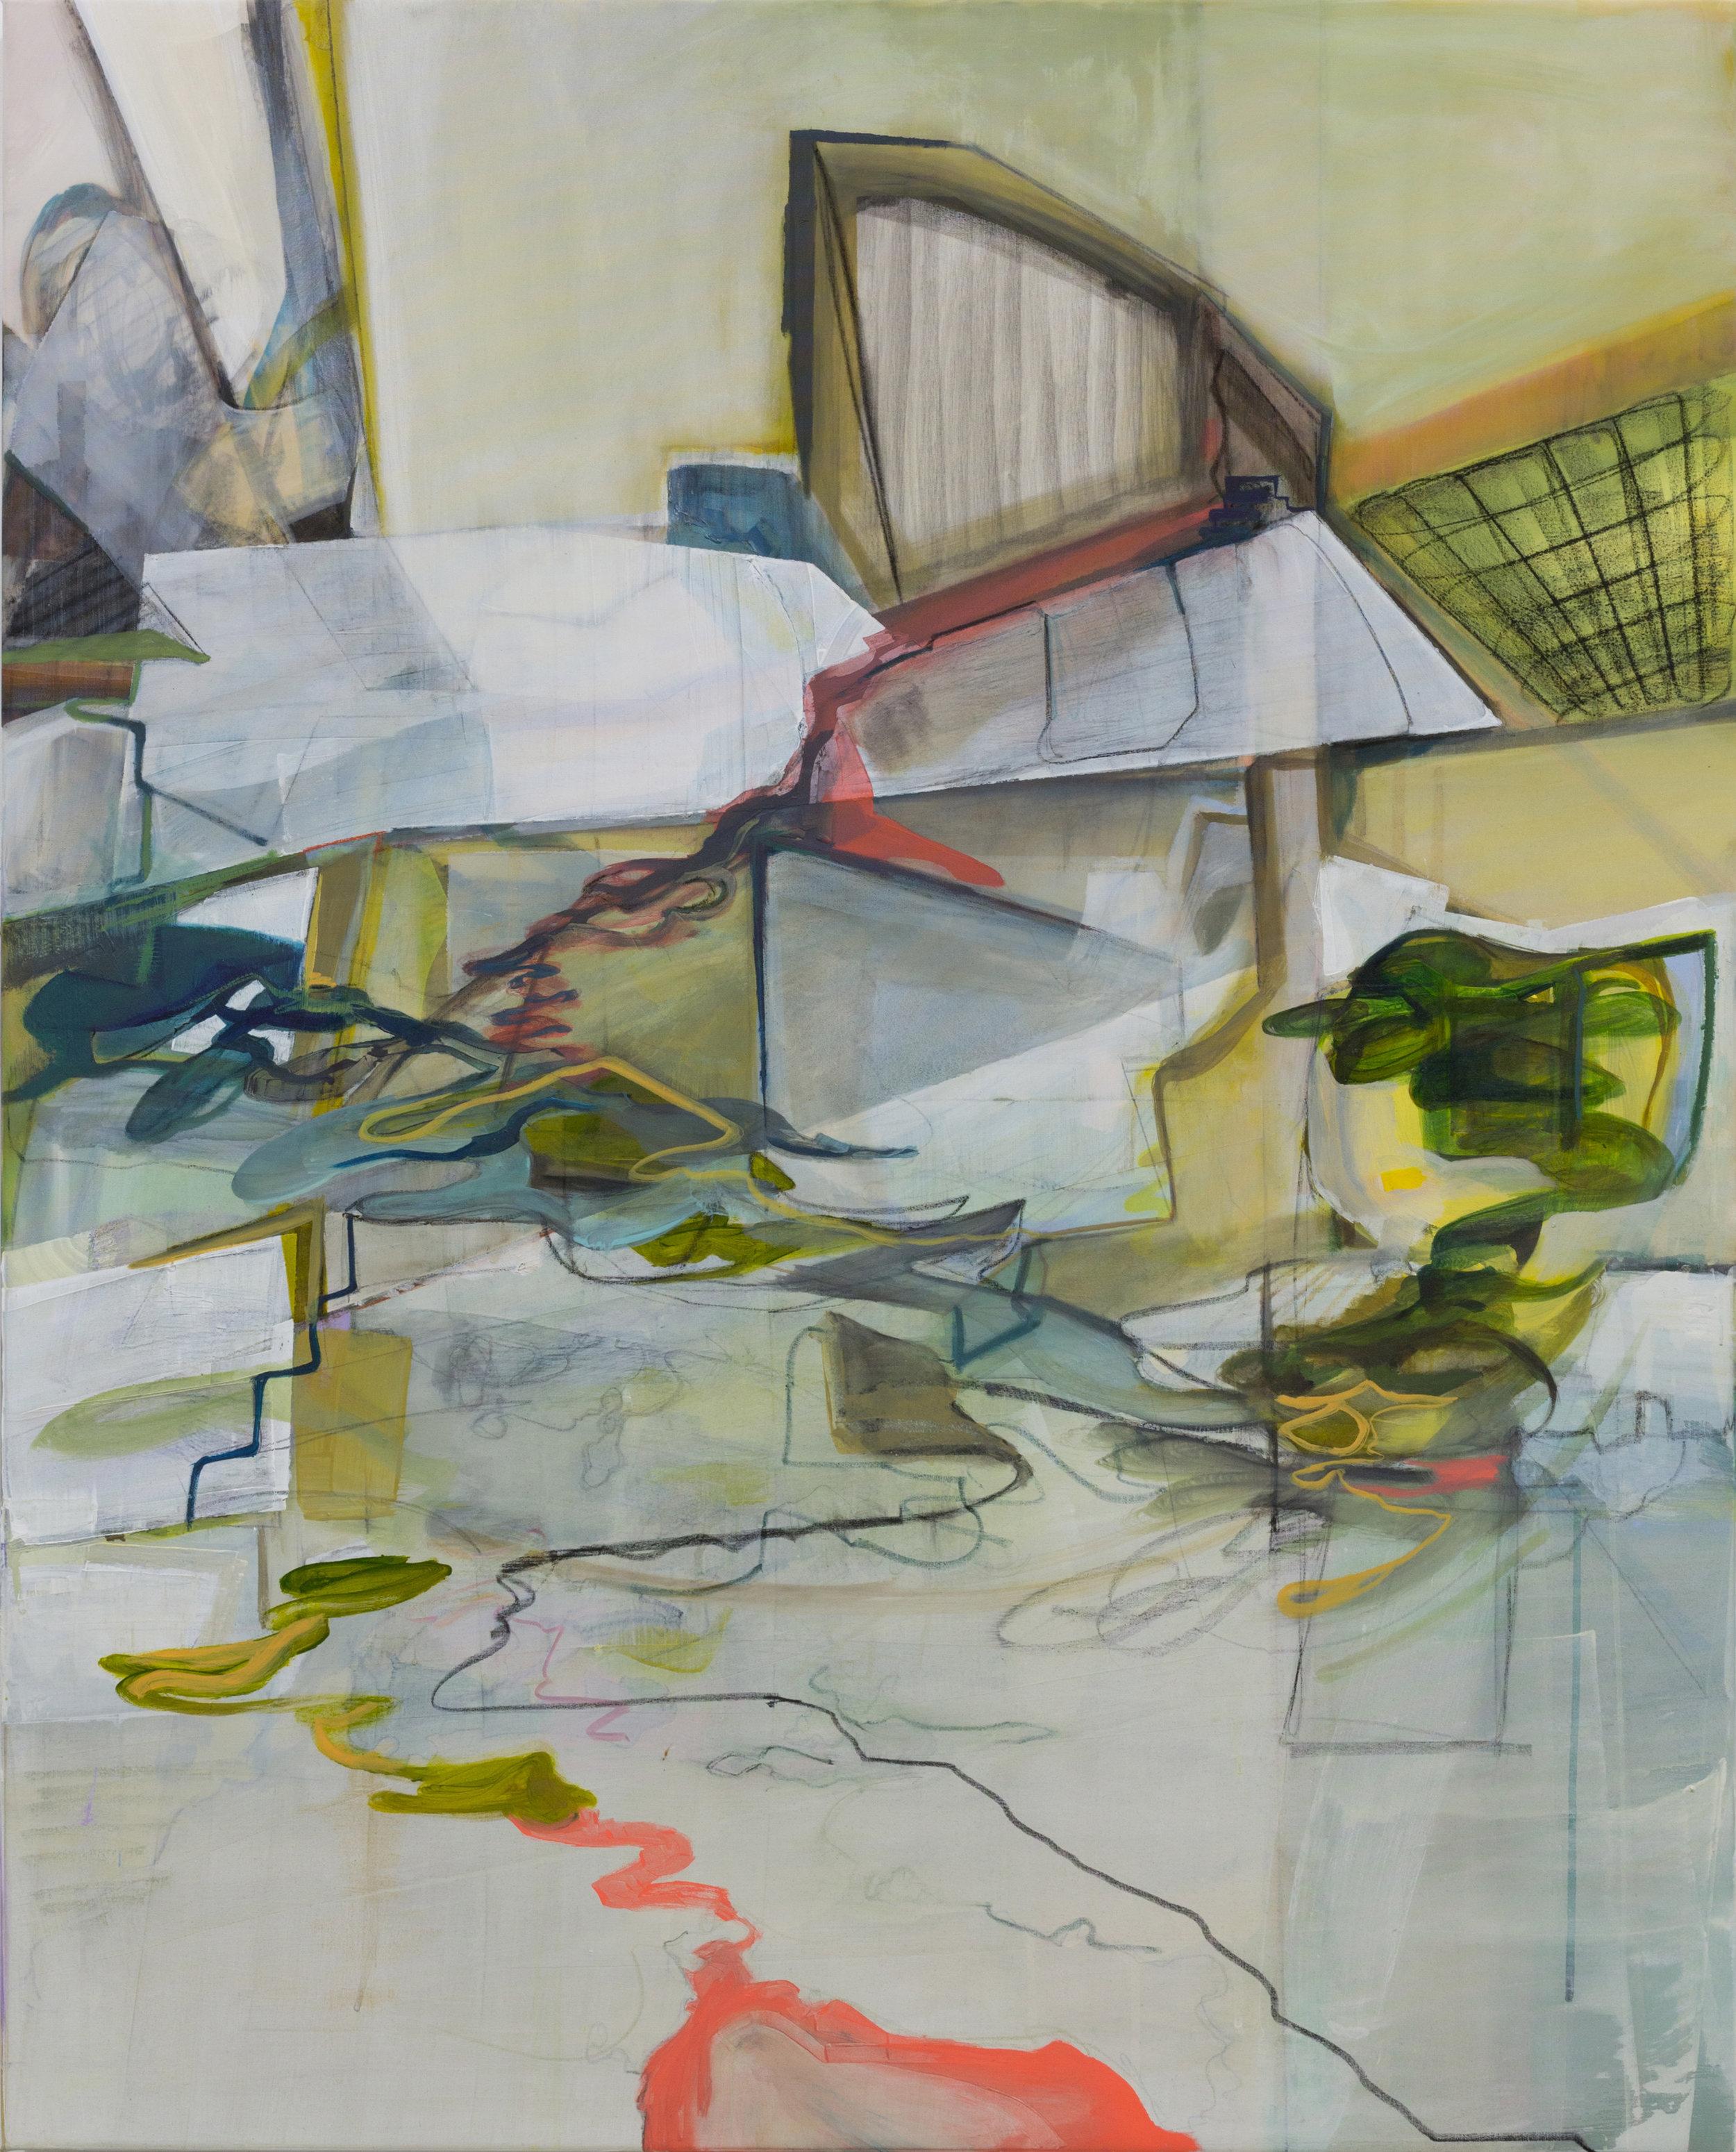 Anna Lytridou, Untitled, Oil on Polyester, 130 x 120 cm,  http://www.annalytridou.com